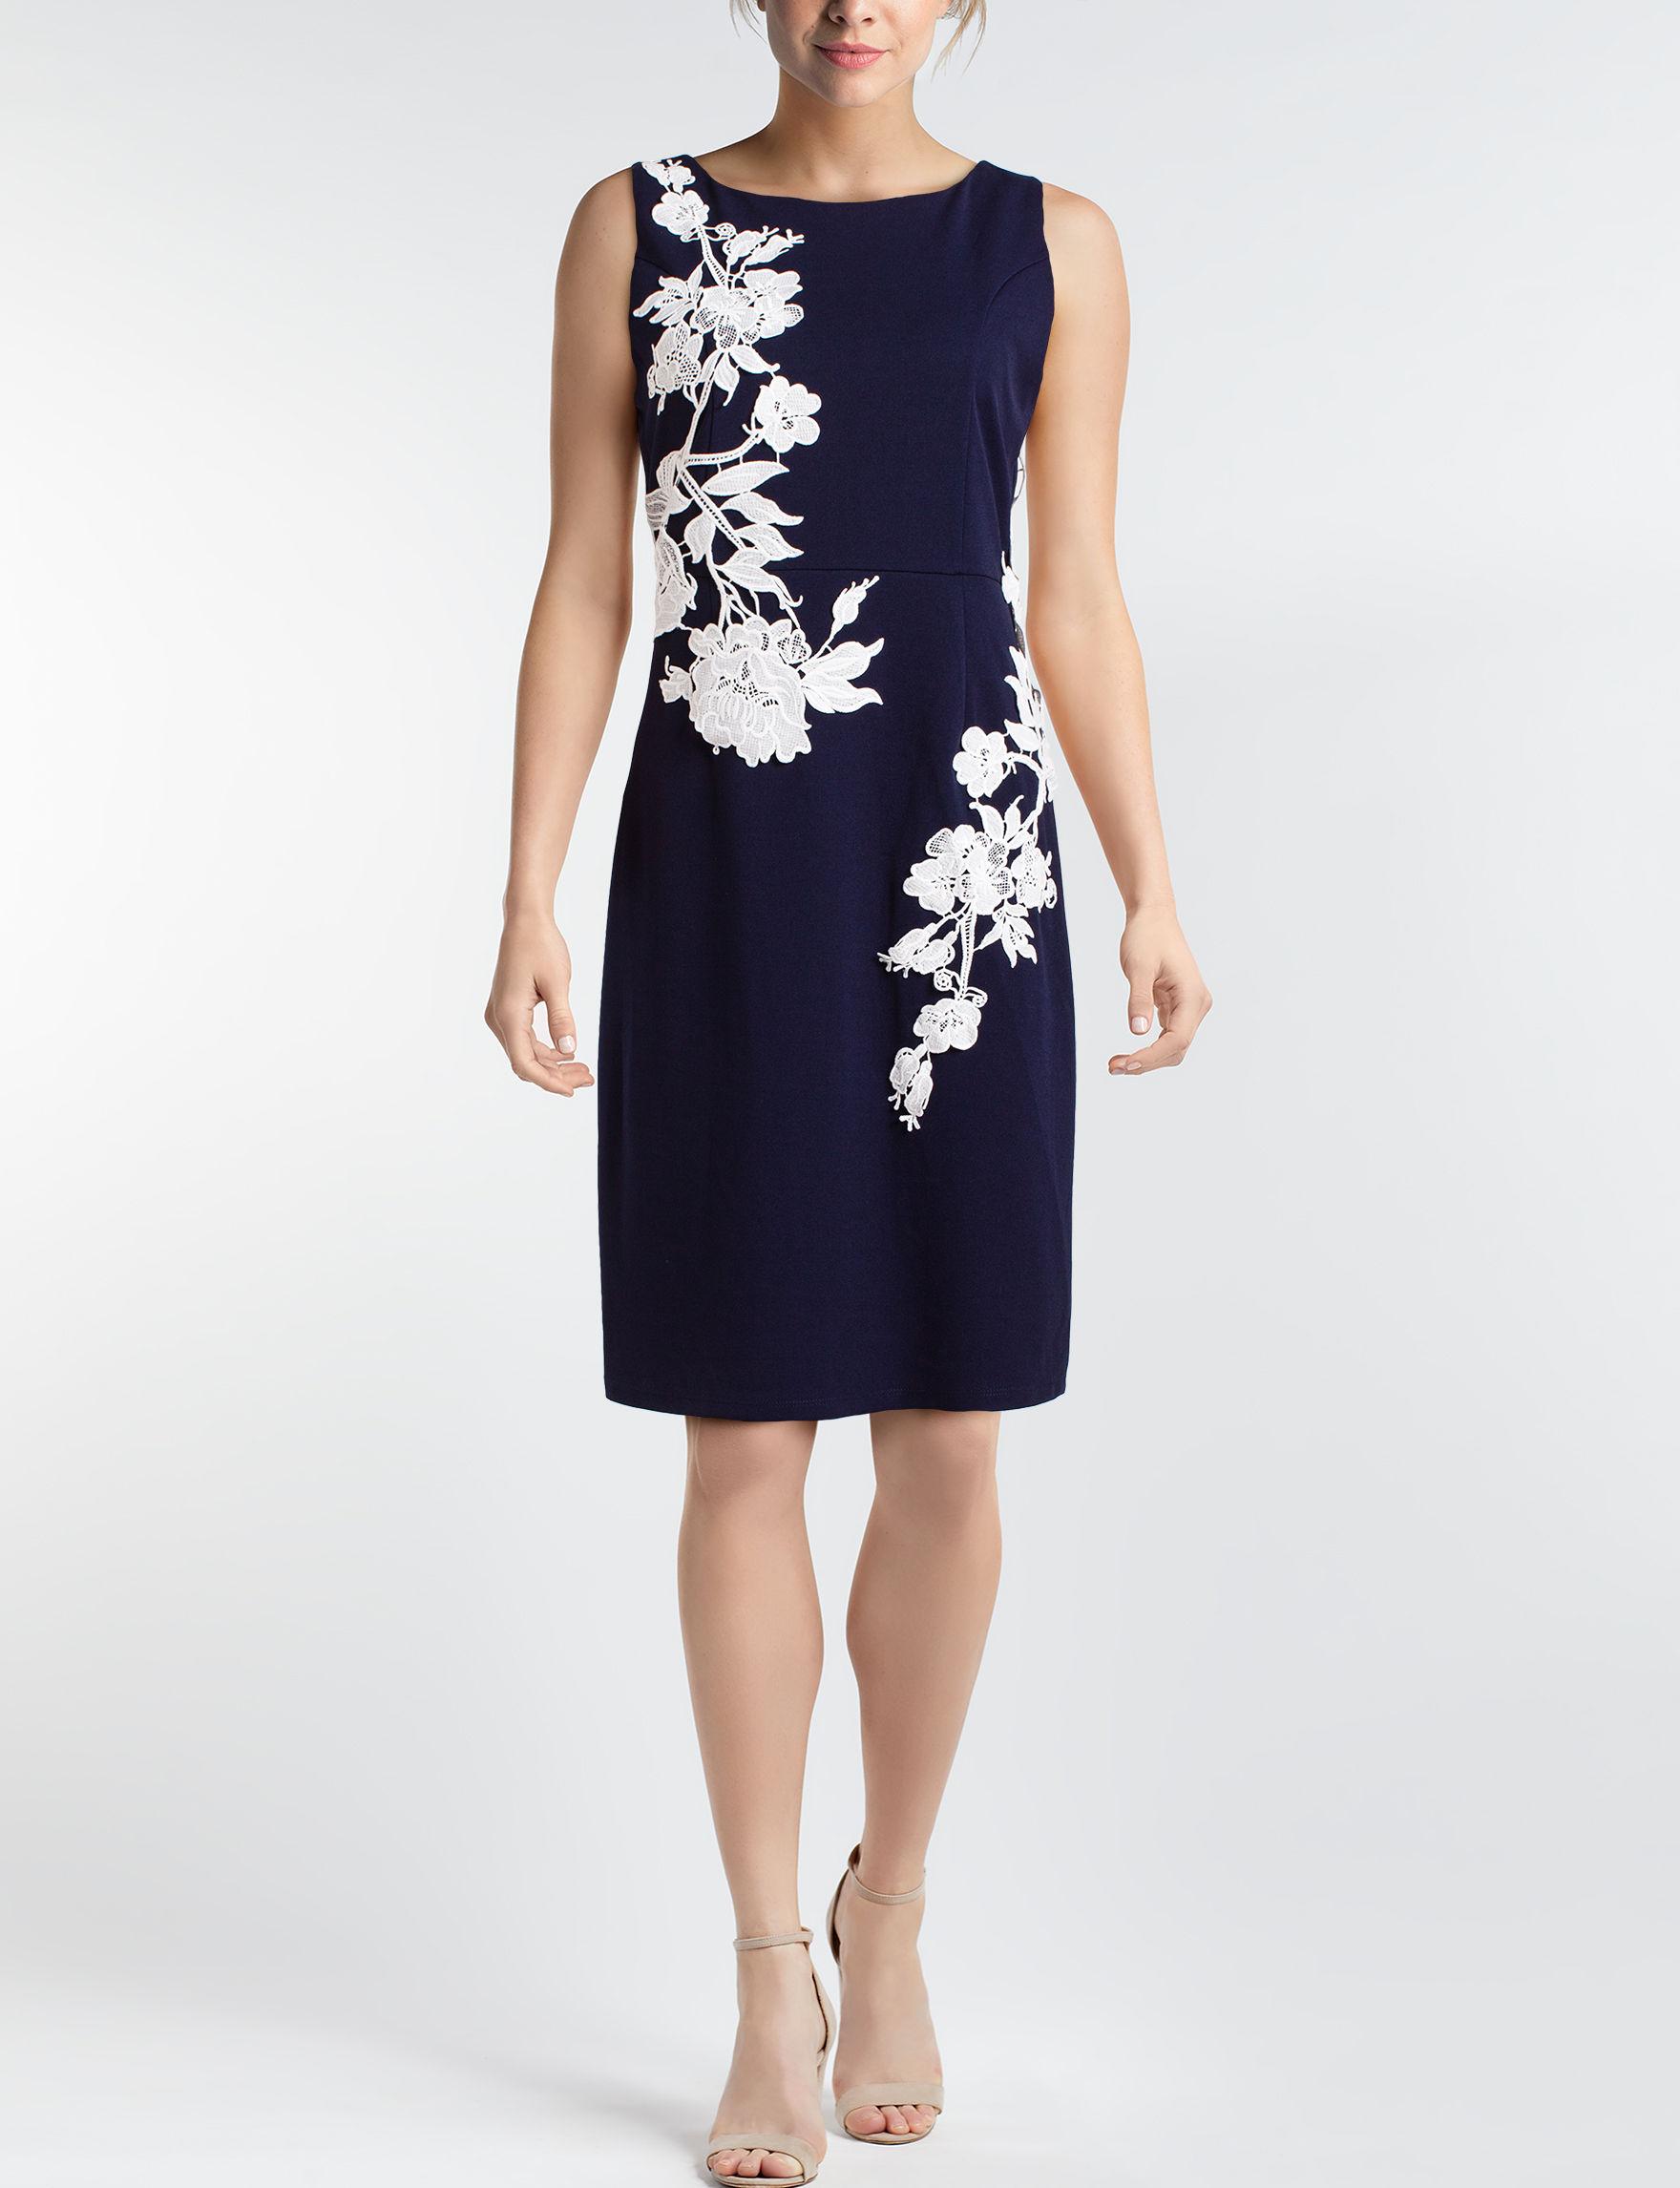 Nina Leonard Light Blue Everyday & Casual Sheath Dresses